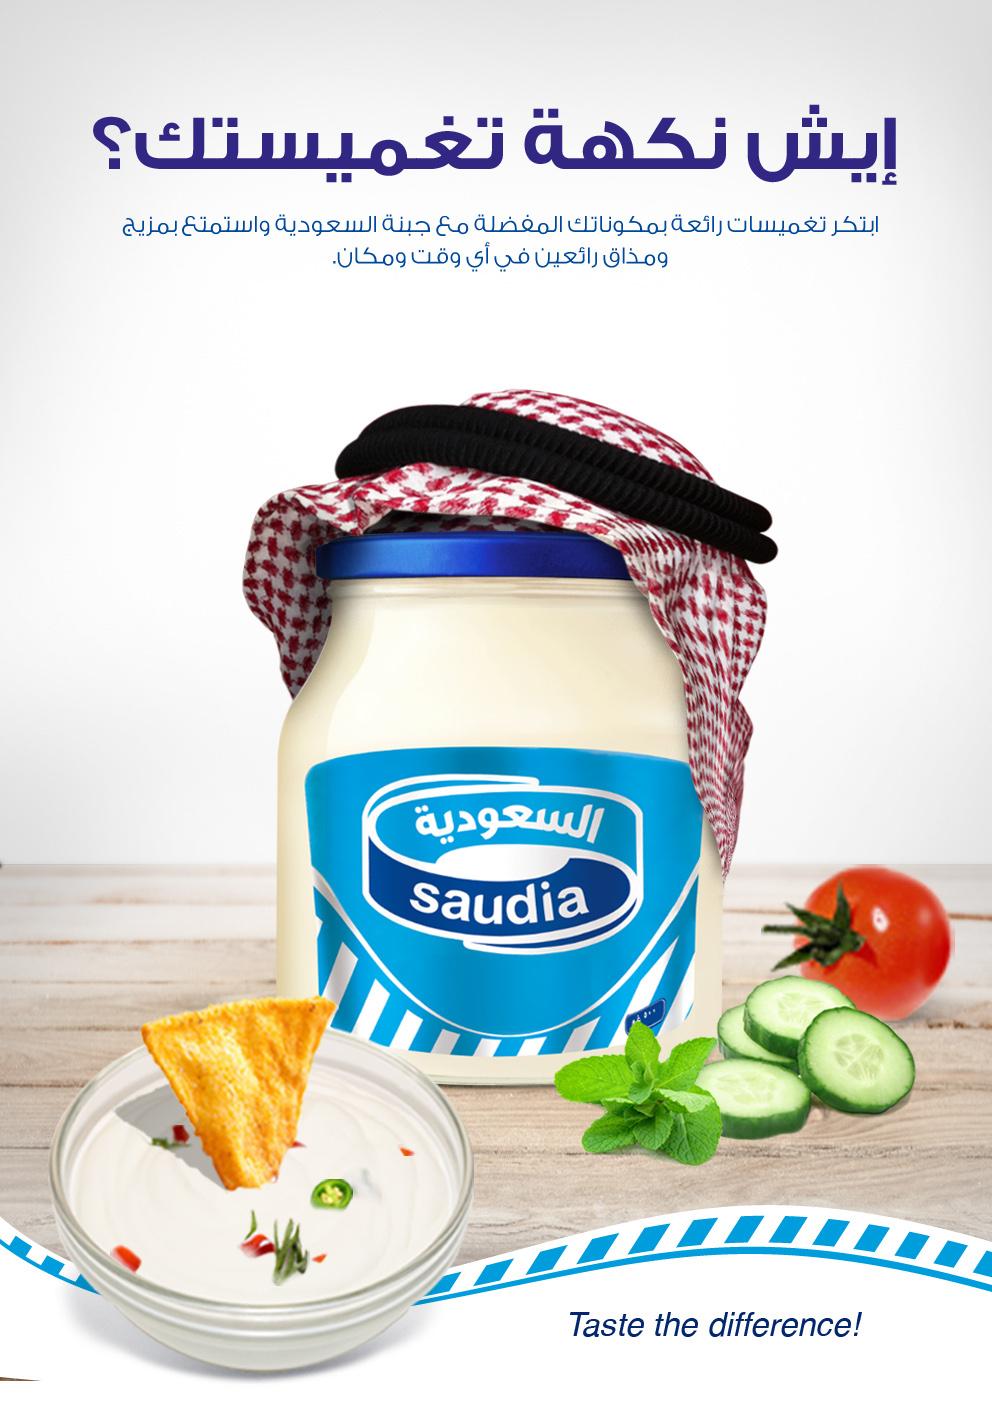 SAUDIA DAIRY AND FOOD STUFF COMPANY on Behance